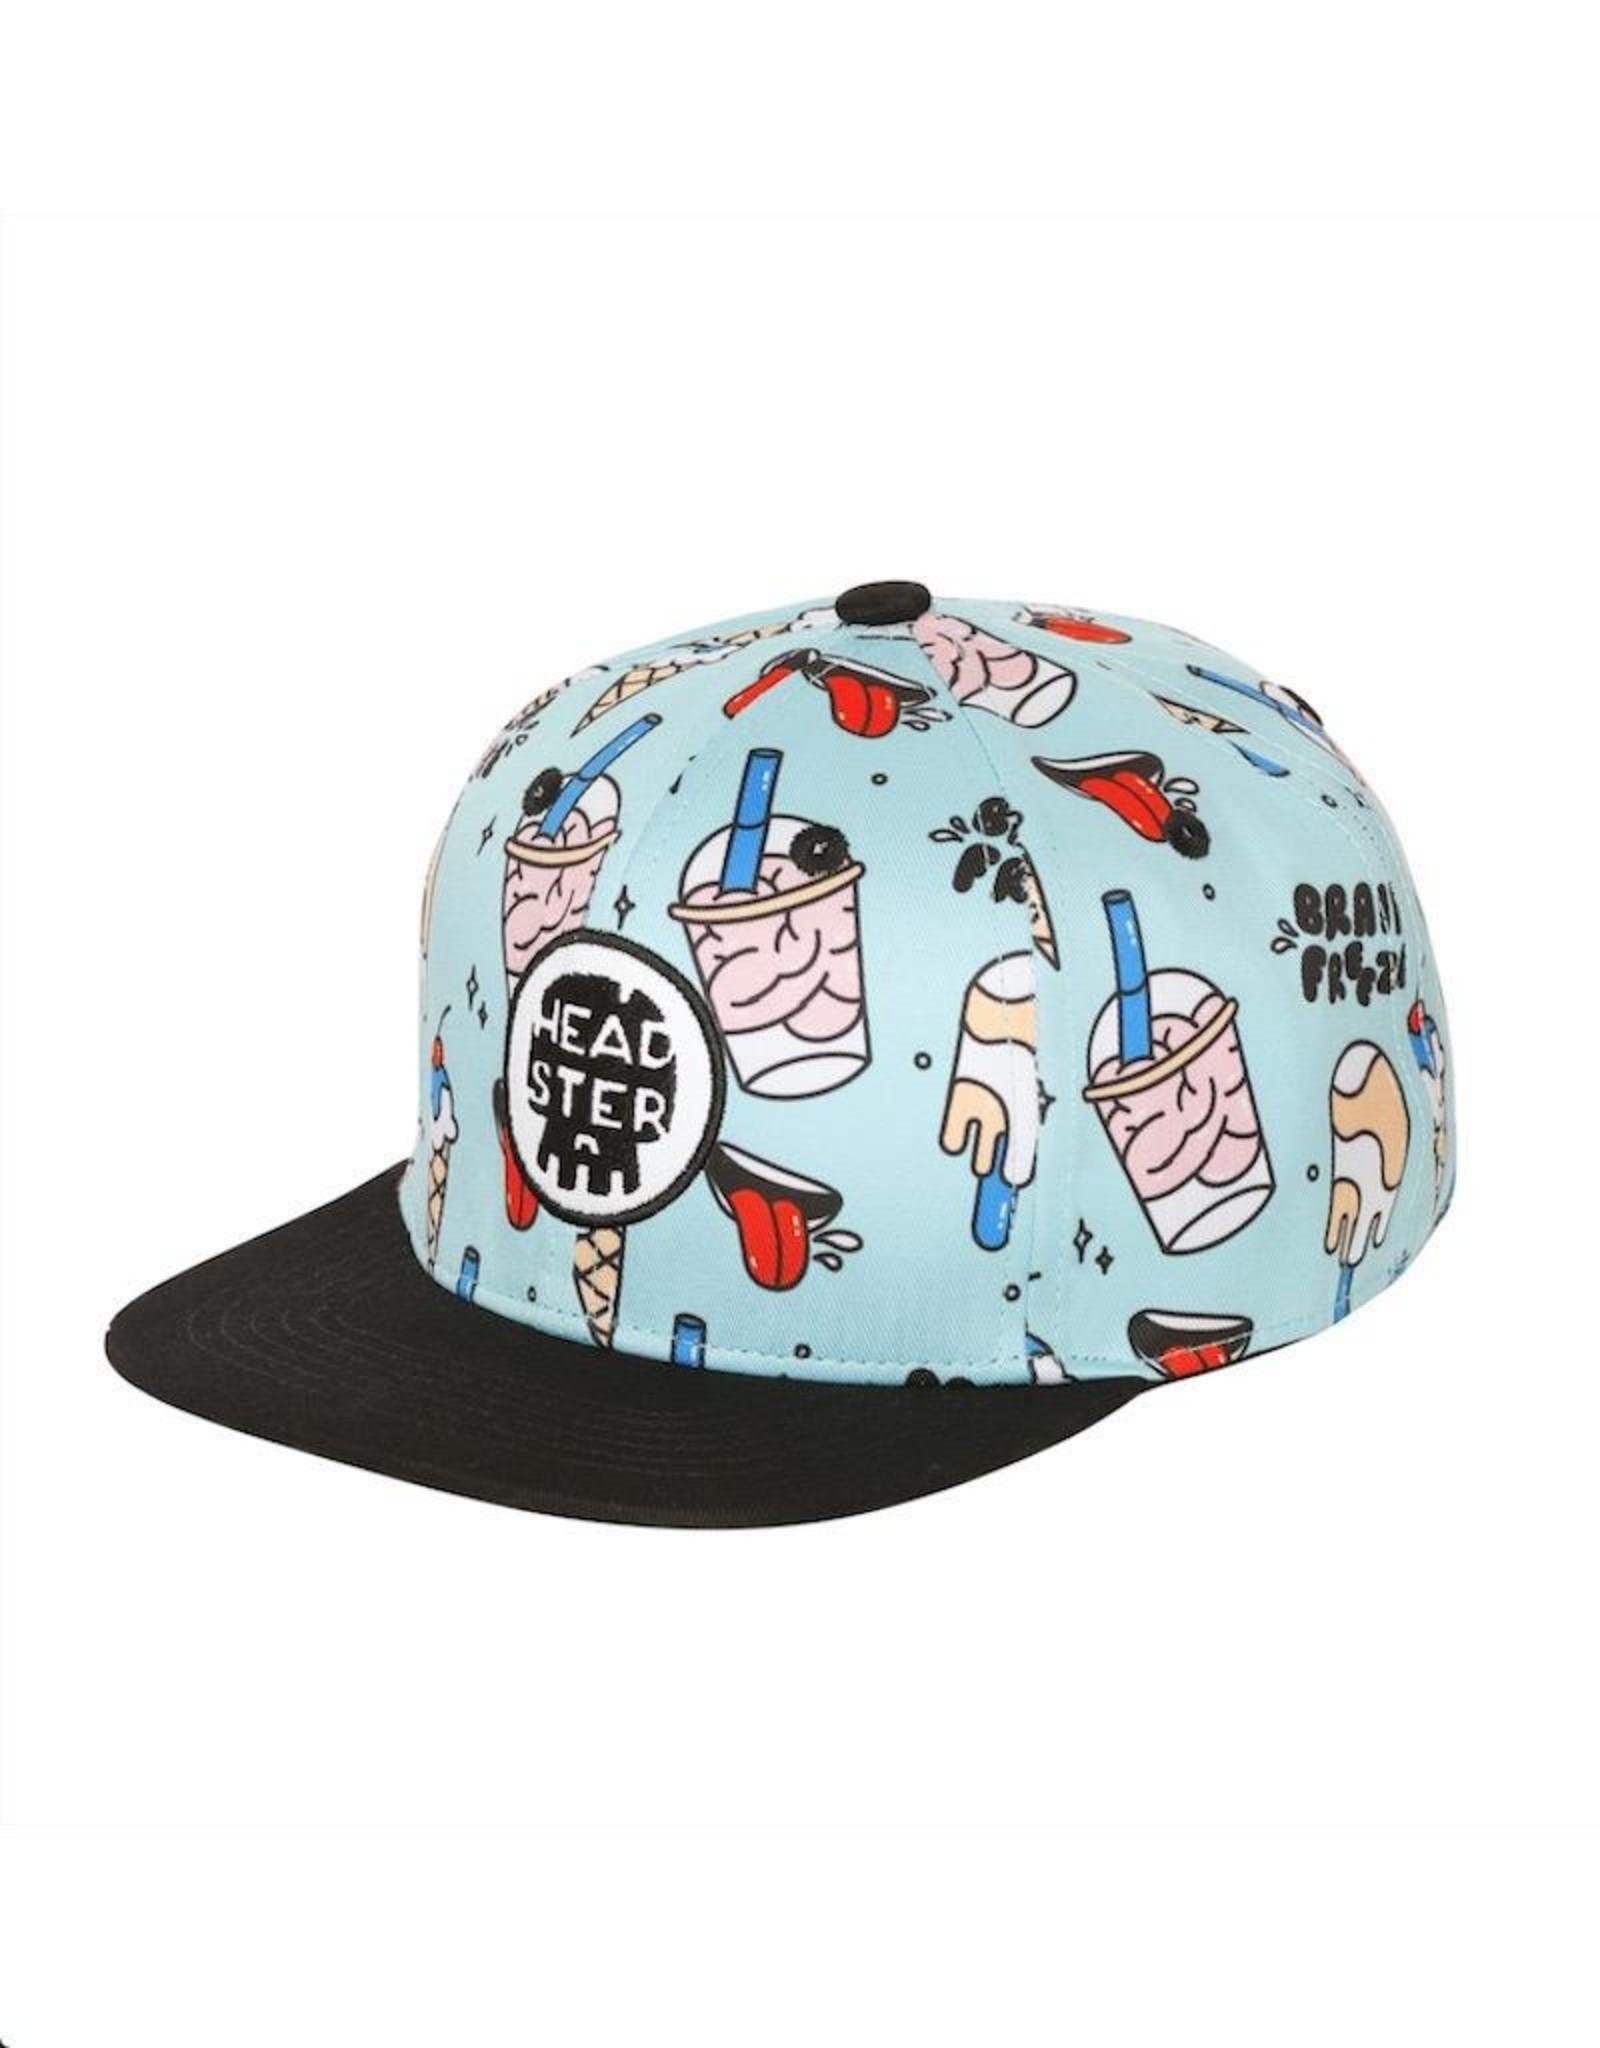 Headster Kids Brain Freeze Adjustable Hat